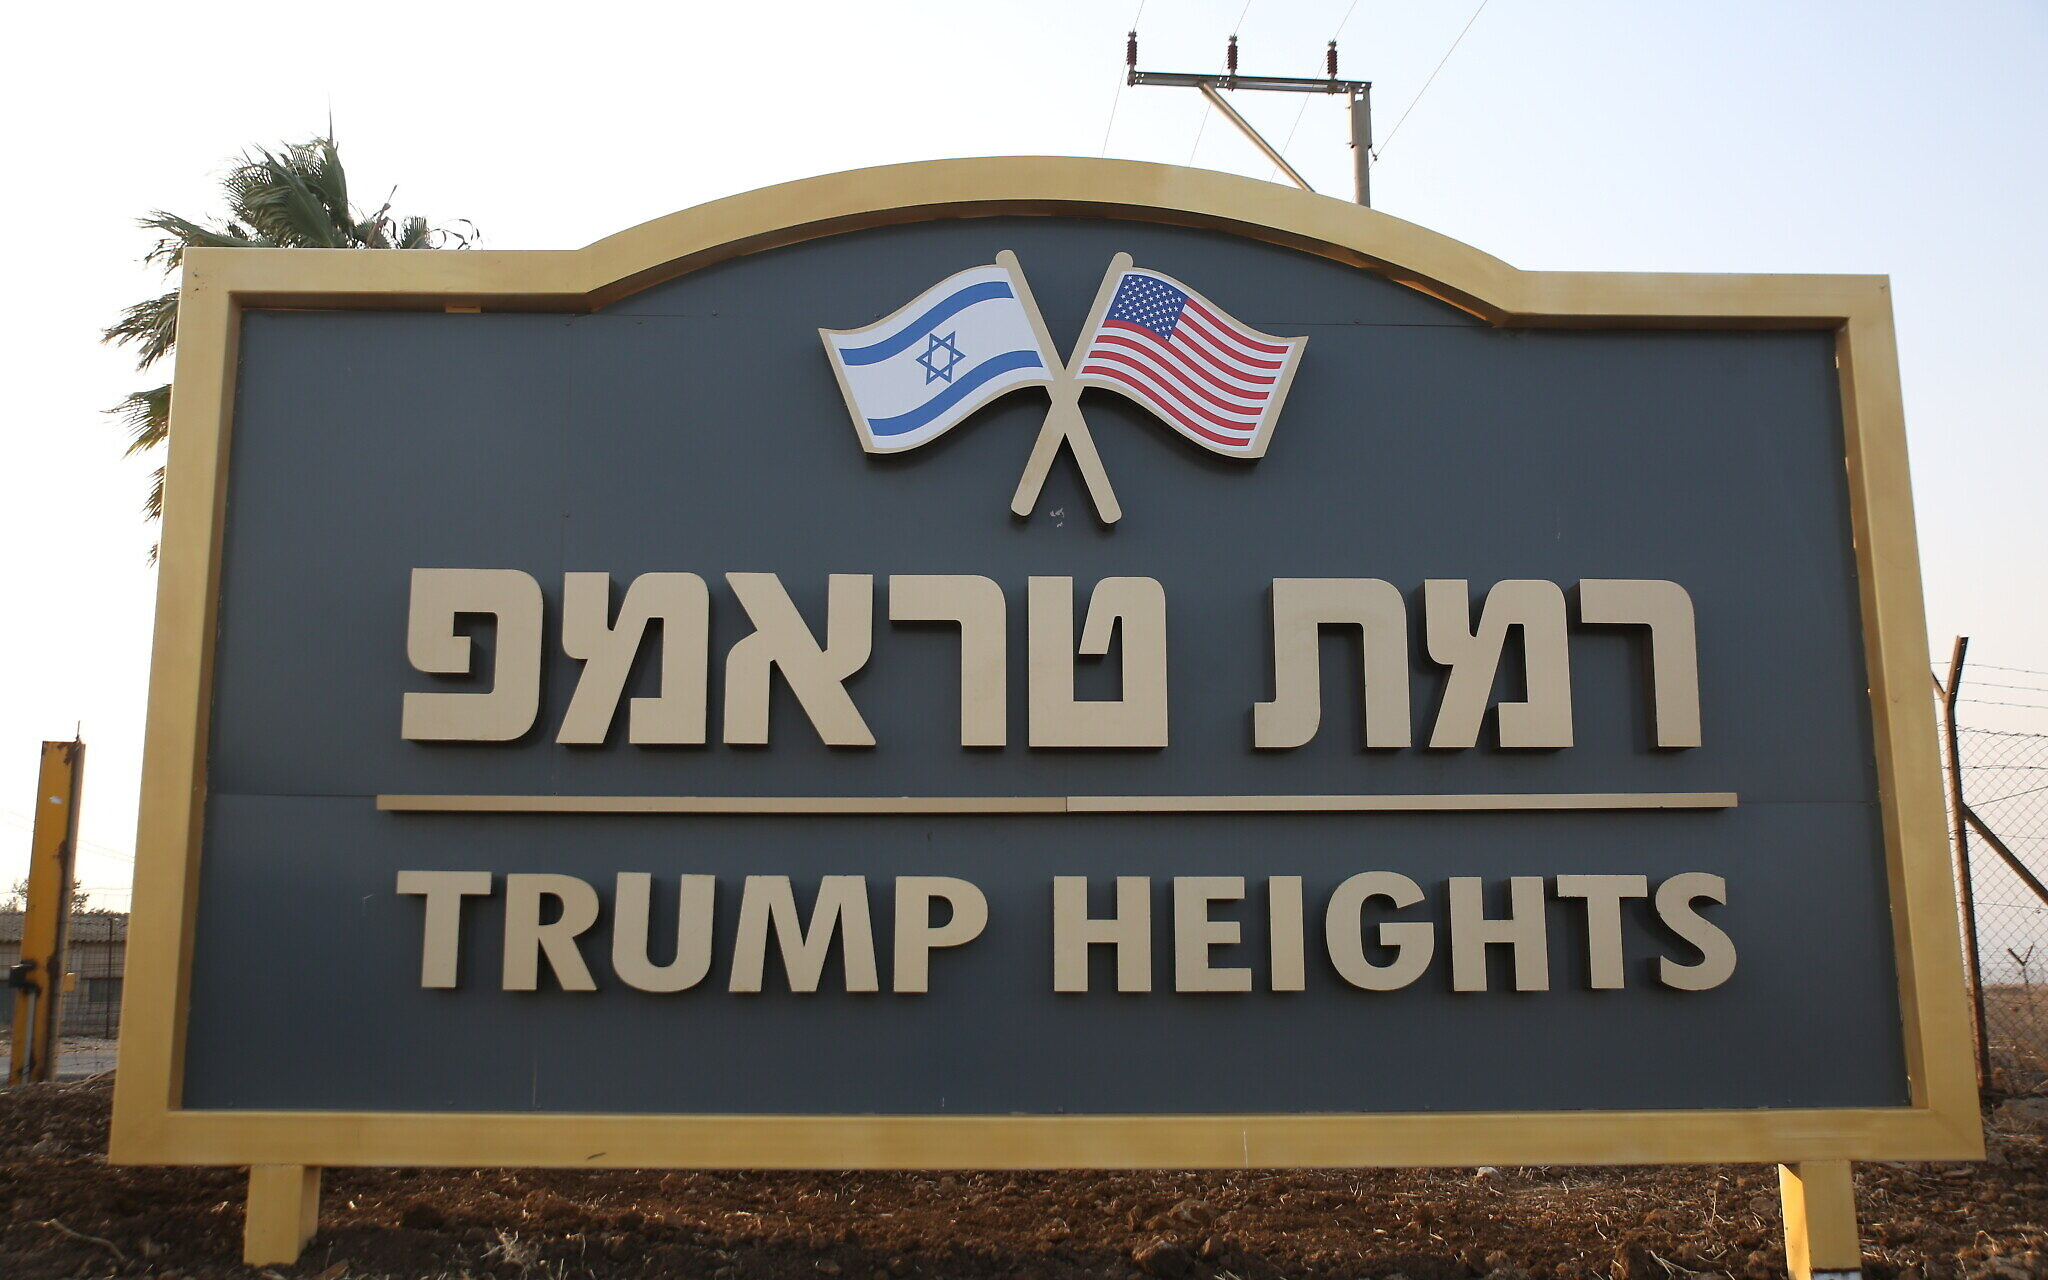 https://static.timesofisrael.com/www/uploads/2019/11/F191107DCFF01-e1573227710262.jpg